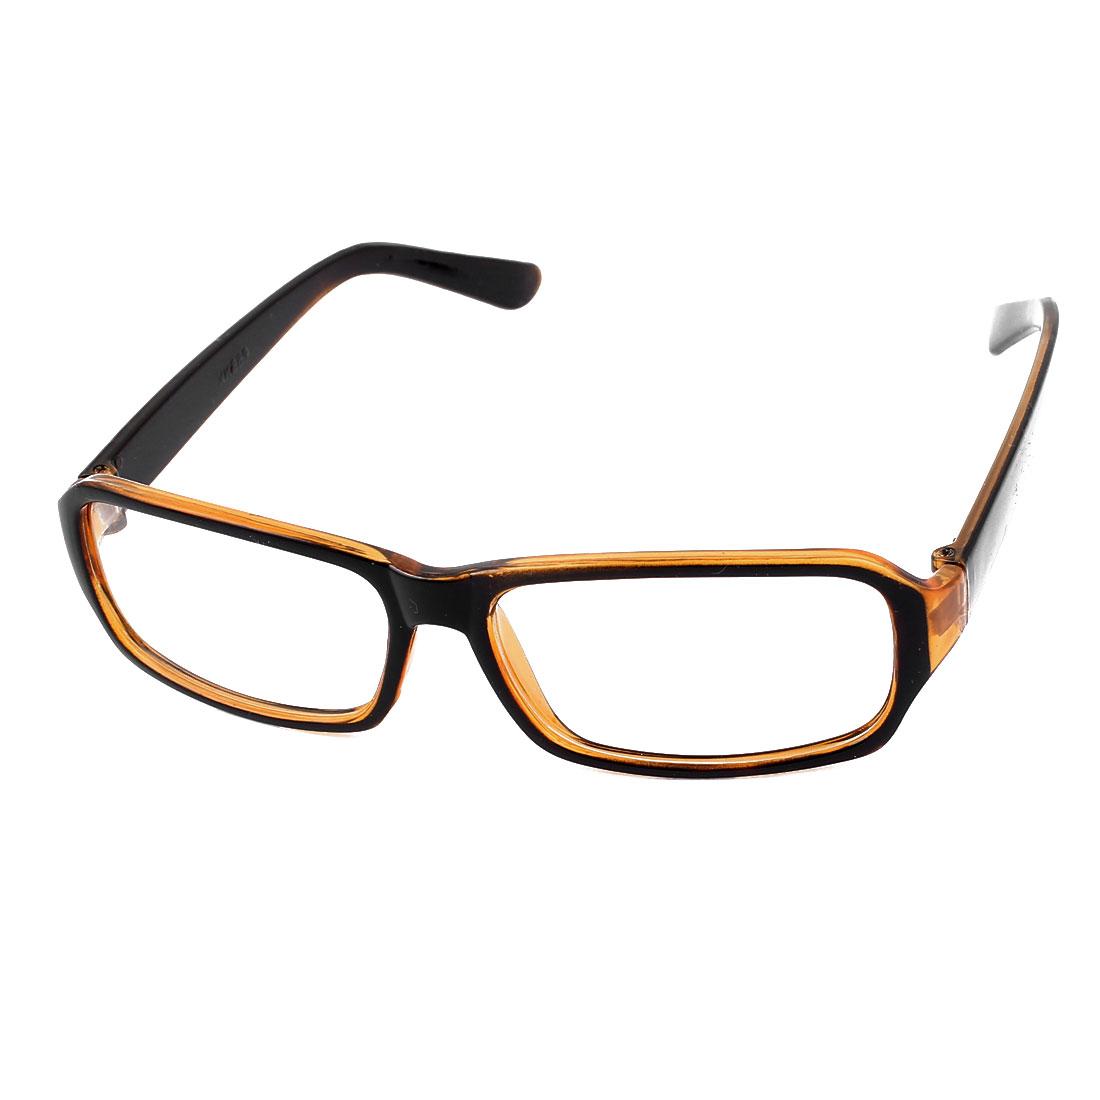 Unisex Single Bridge Rectangle Lens Eyewear Plain Glasses Orange Black